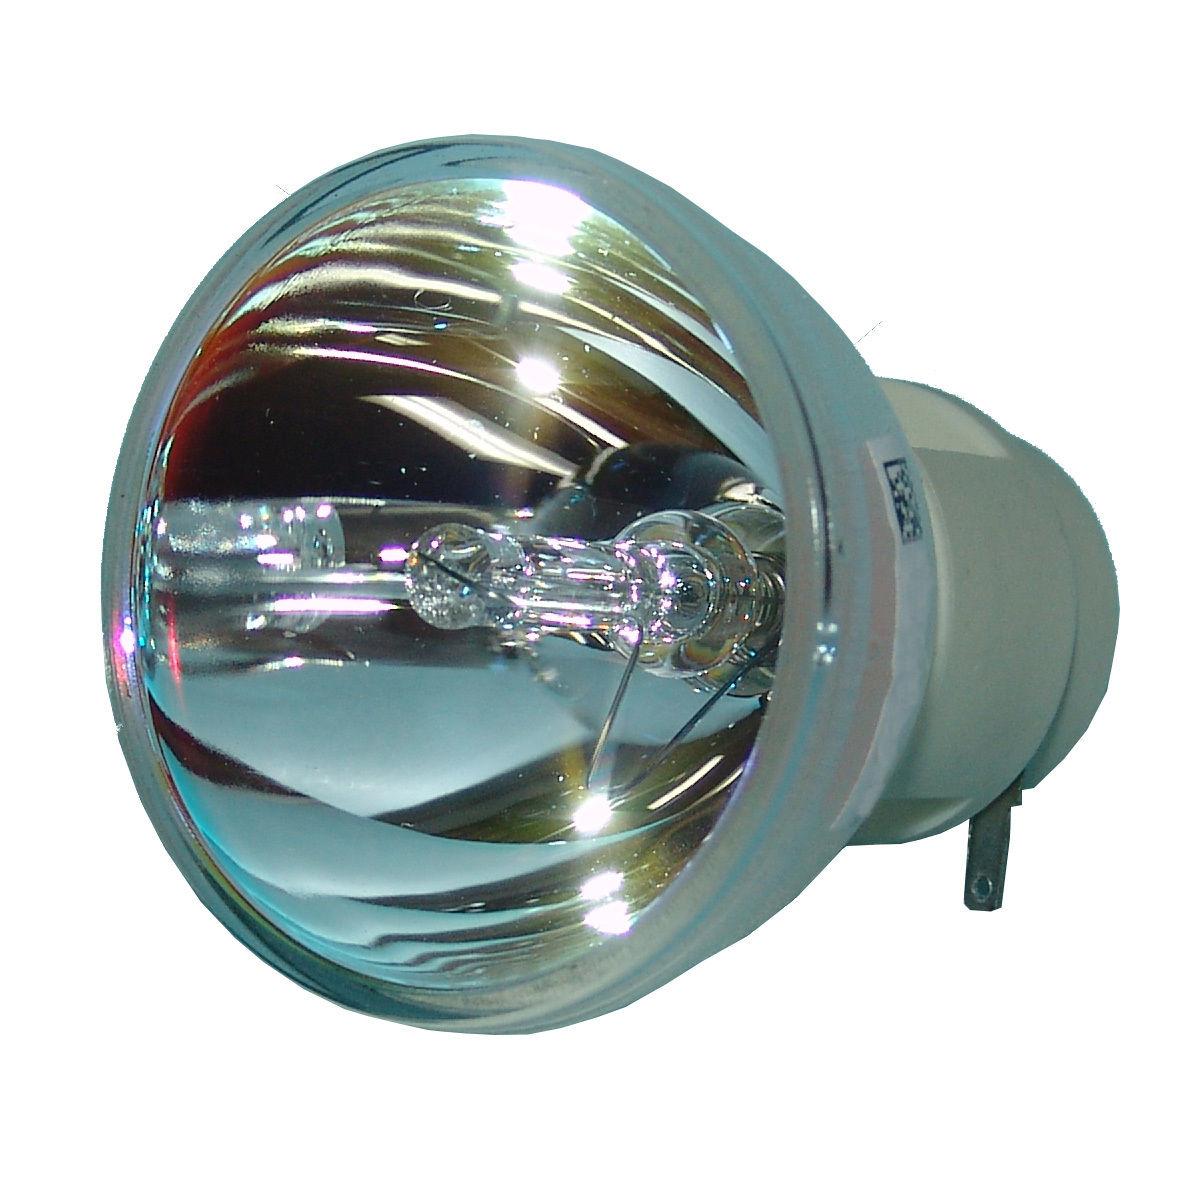 Compatible Bare Bulb 5j J4g05 001 For Benq W1100 W1200